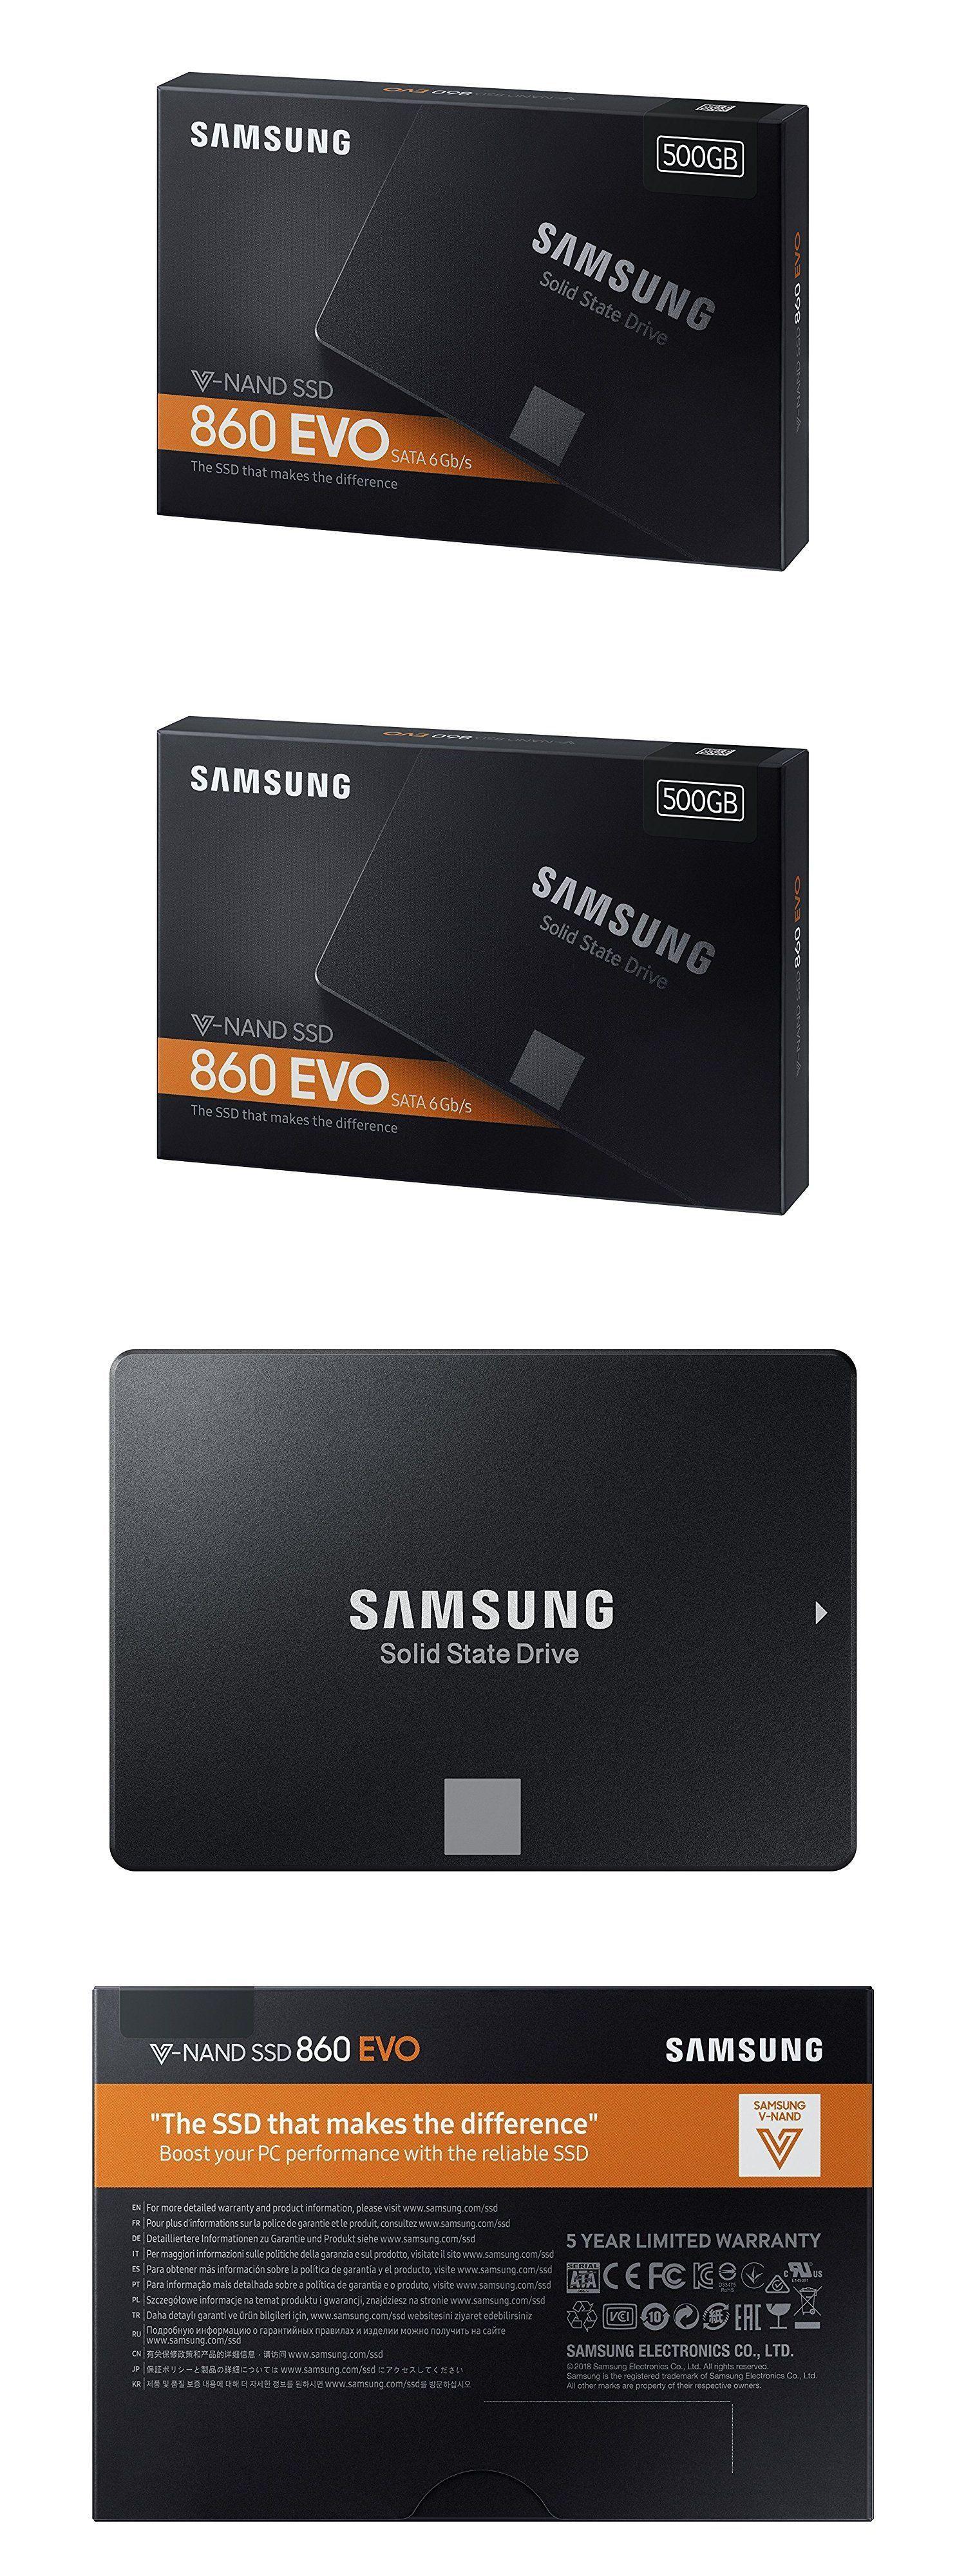 MZ-76E500B//AM Samsung 860 EVO 500GB 2.5 Inch SATA III Internal SSD